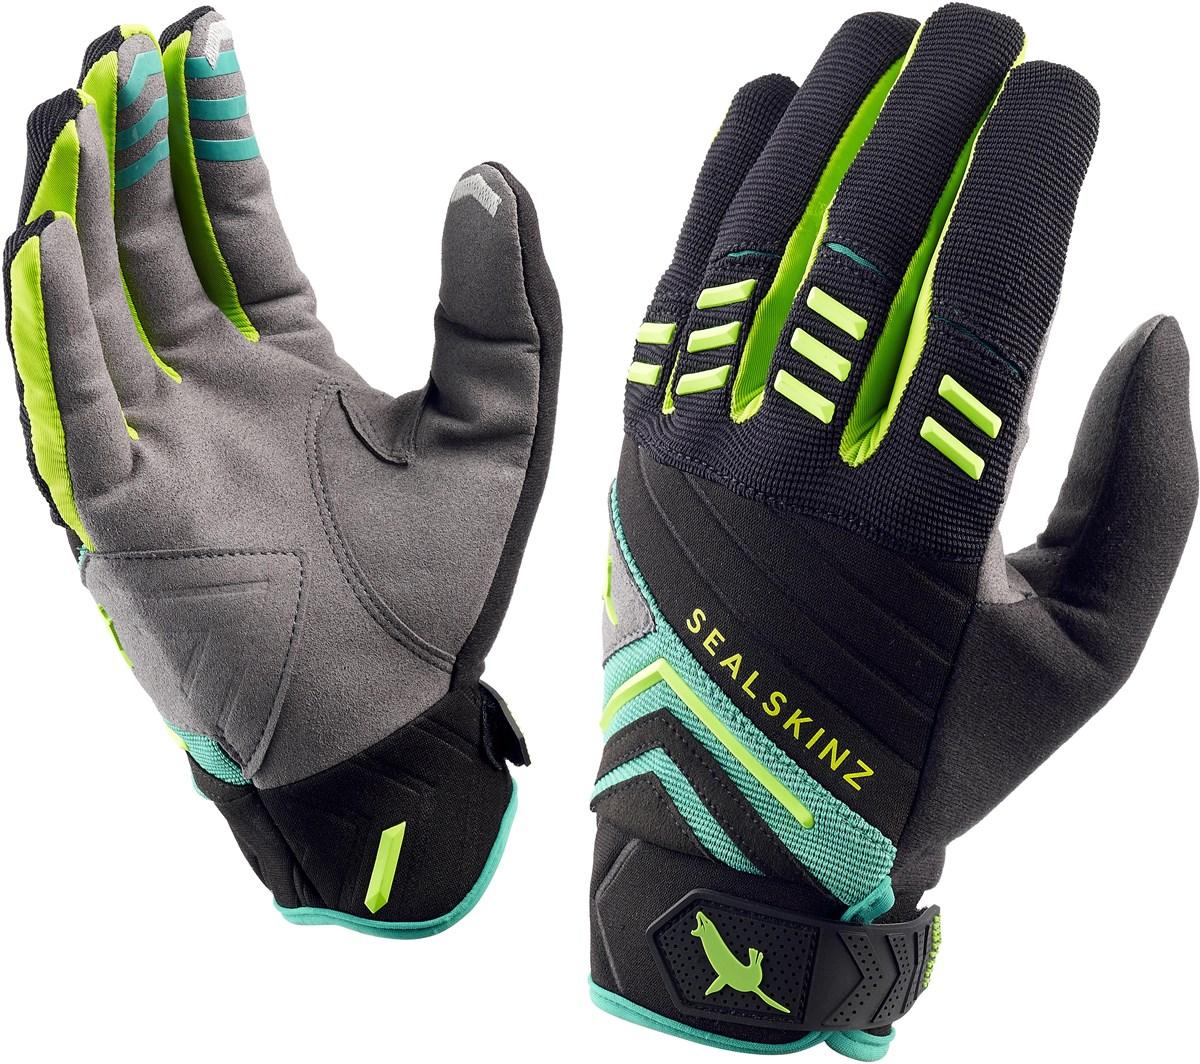 Sealskinz Dragon Eye Trail Long Finger Cycling Gloves | Handsker